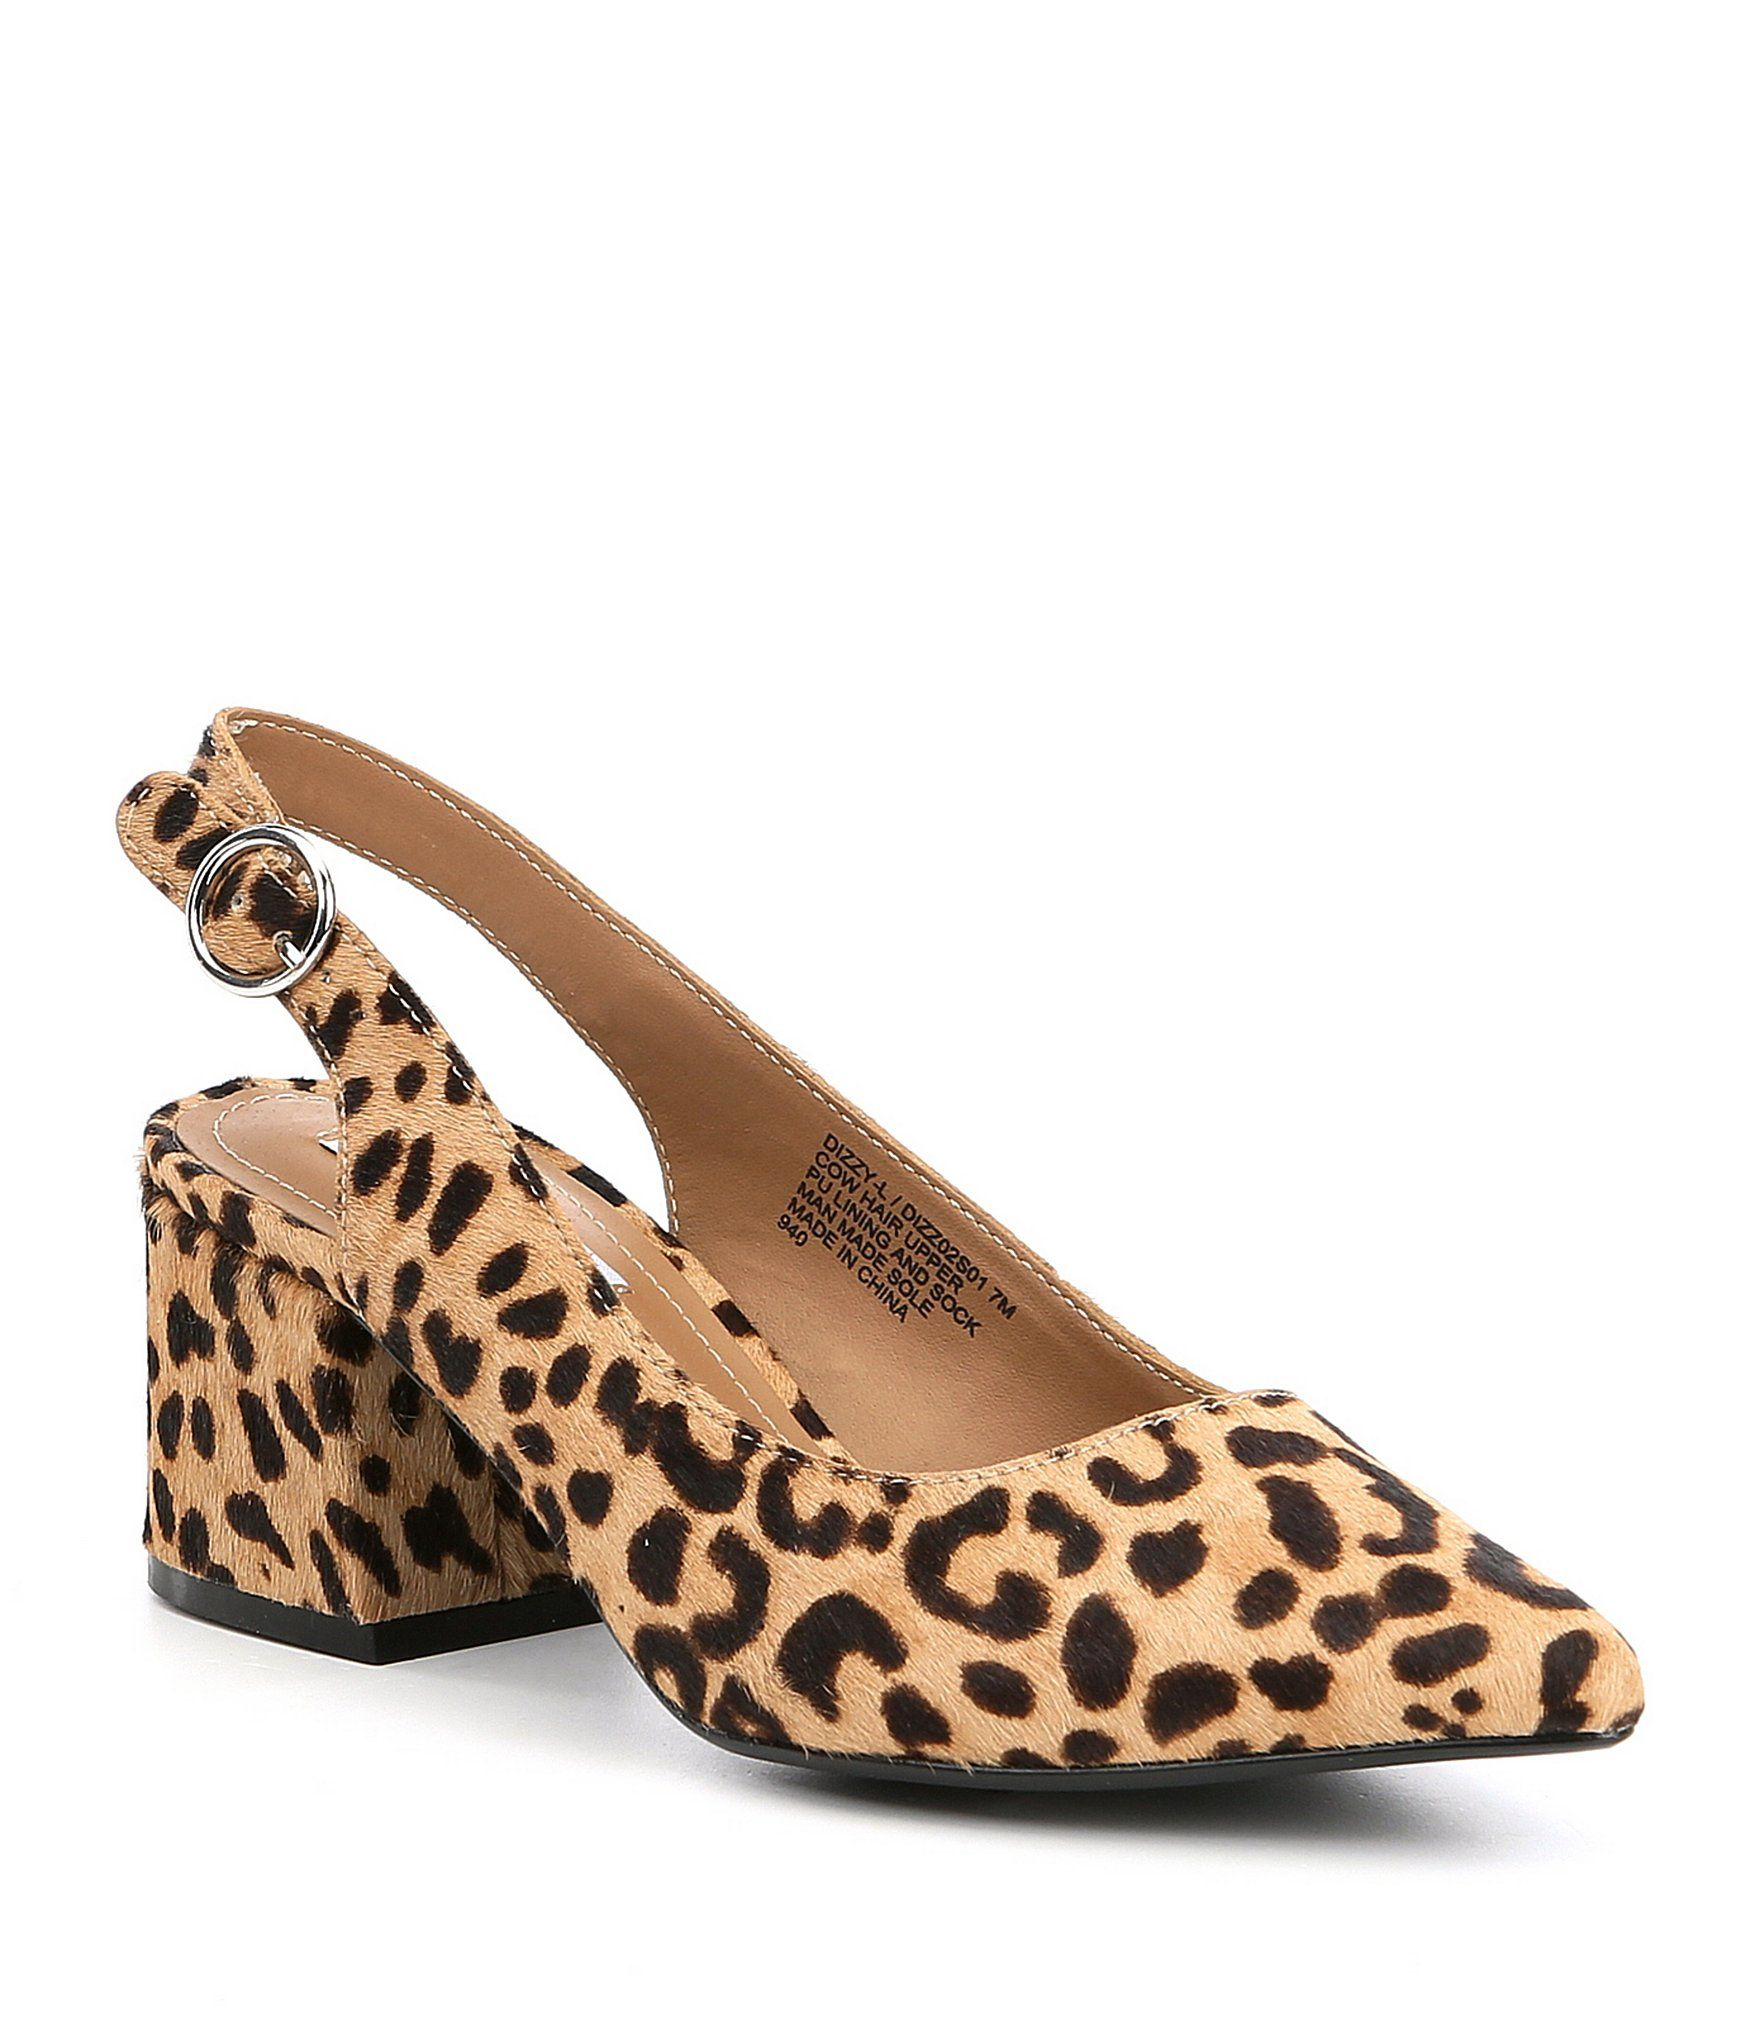 7086c2b5412 Steve Madden Dizzy Leopard Print Calf Hair Slingback Block Heel ...